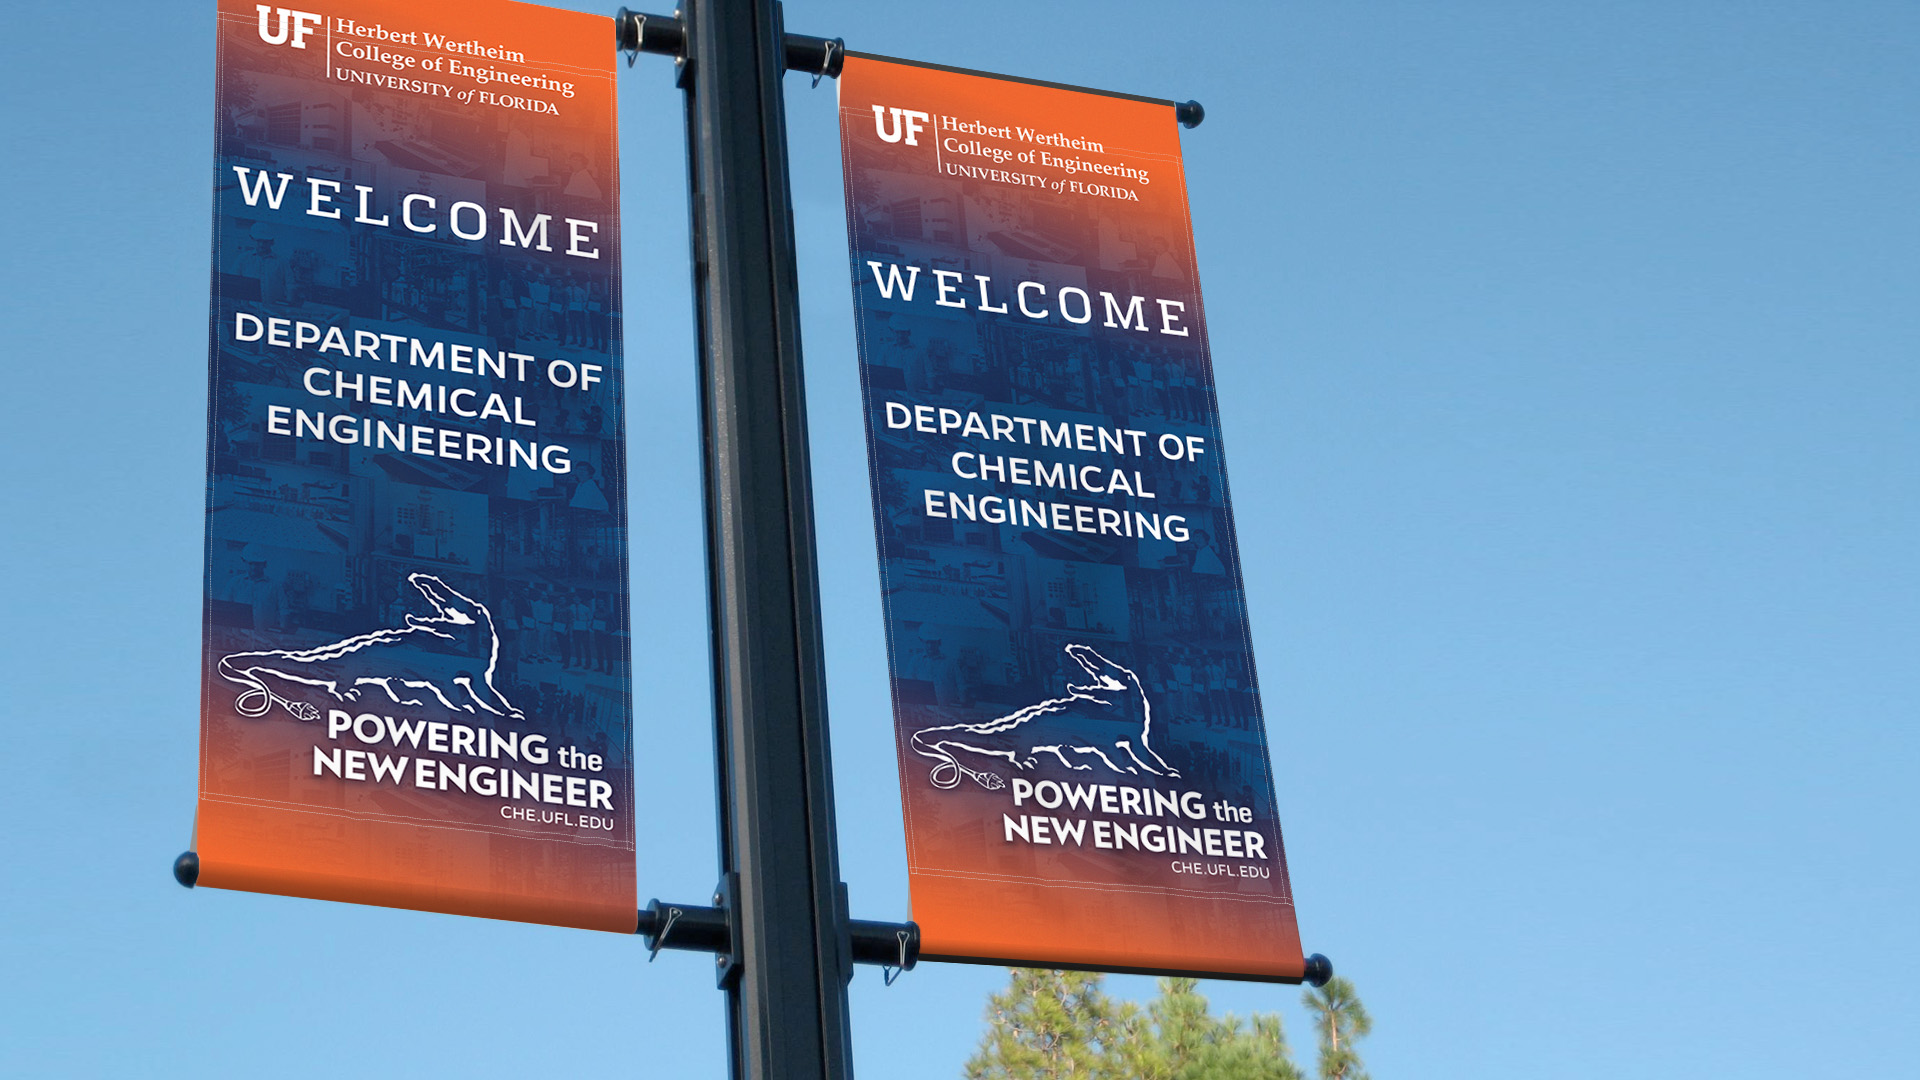 UF Banner Design Lamp Post_Wayfinding